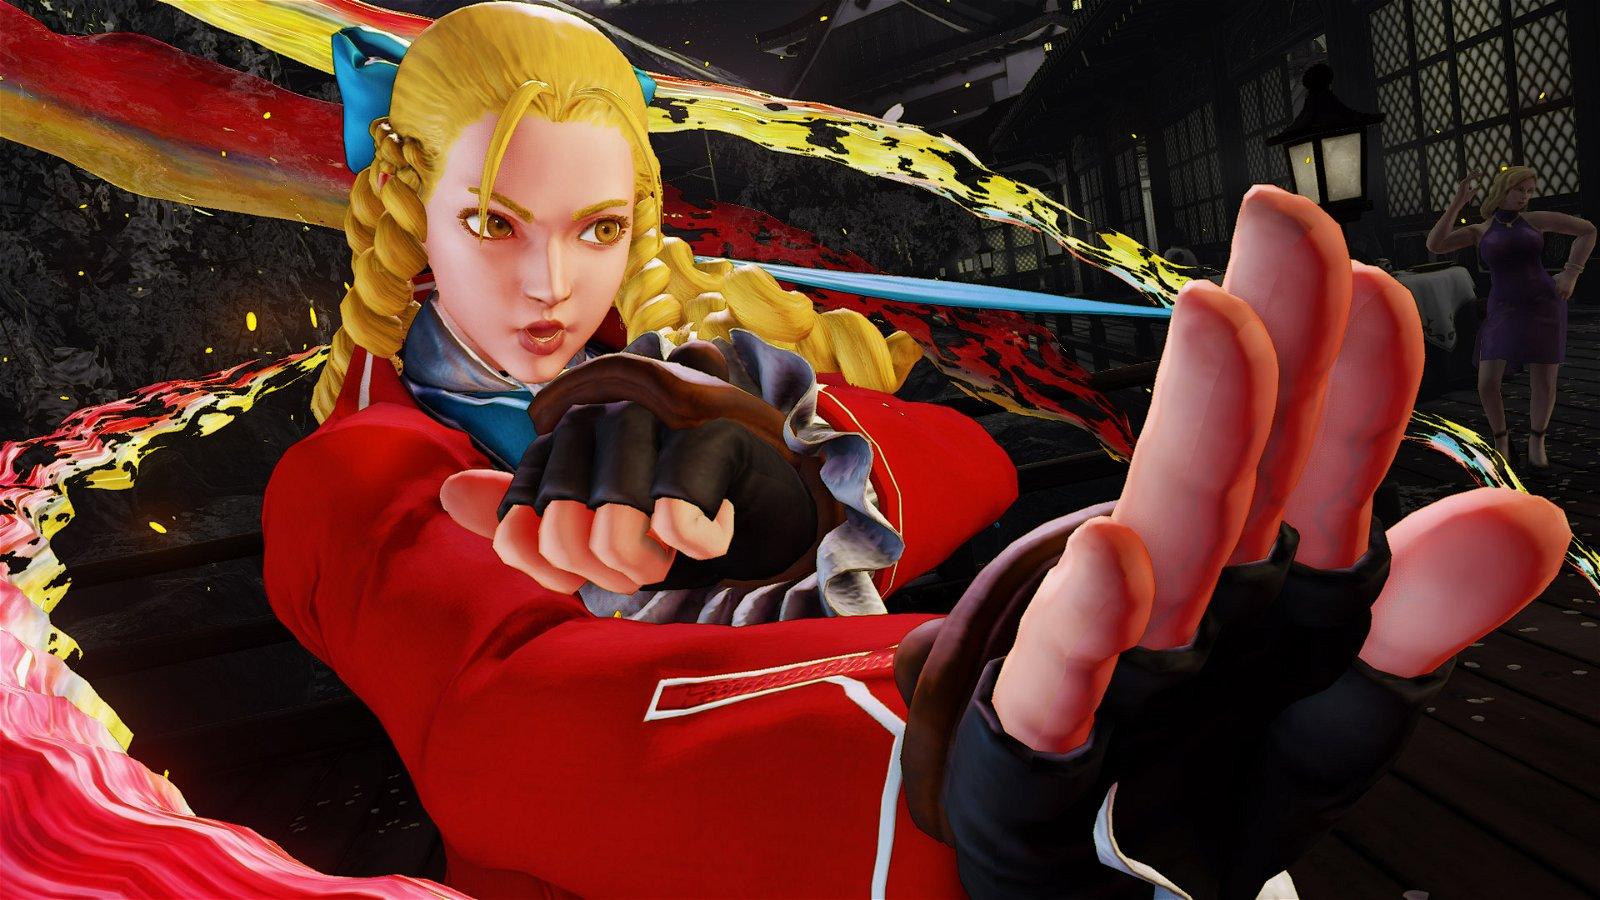 Hadouken: A History Of Street Fighter 3